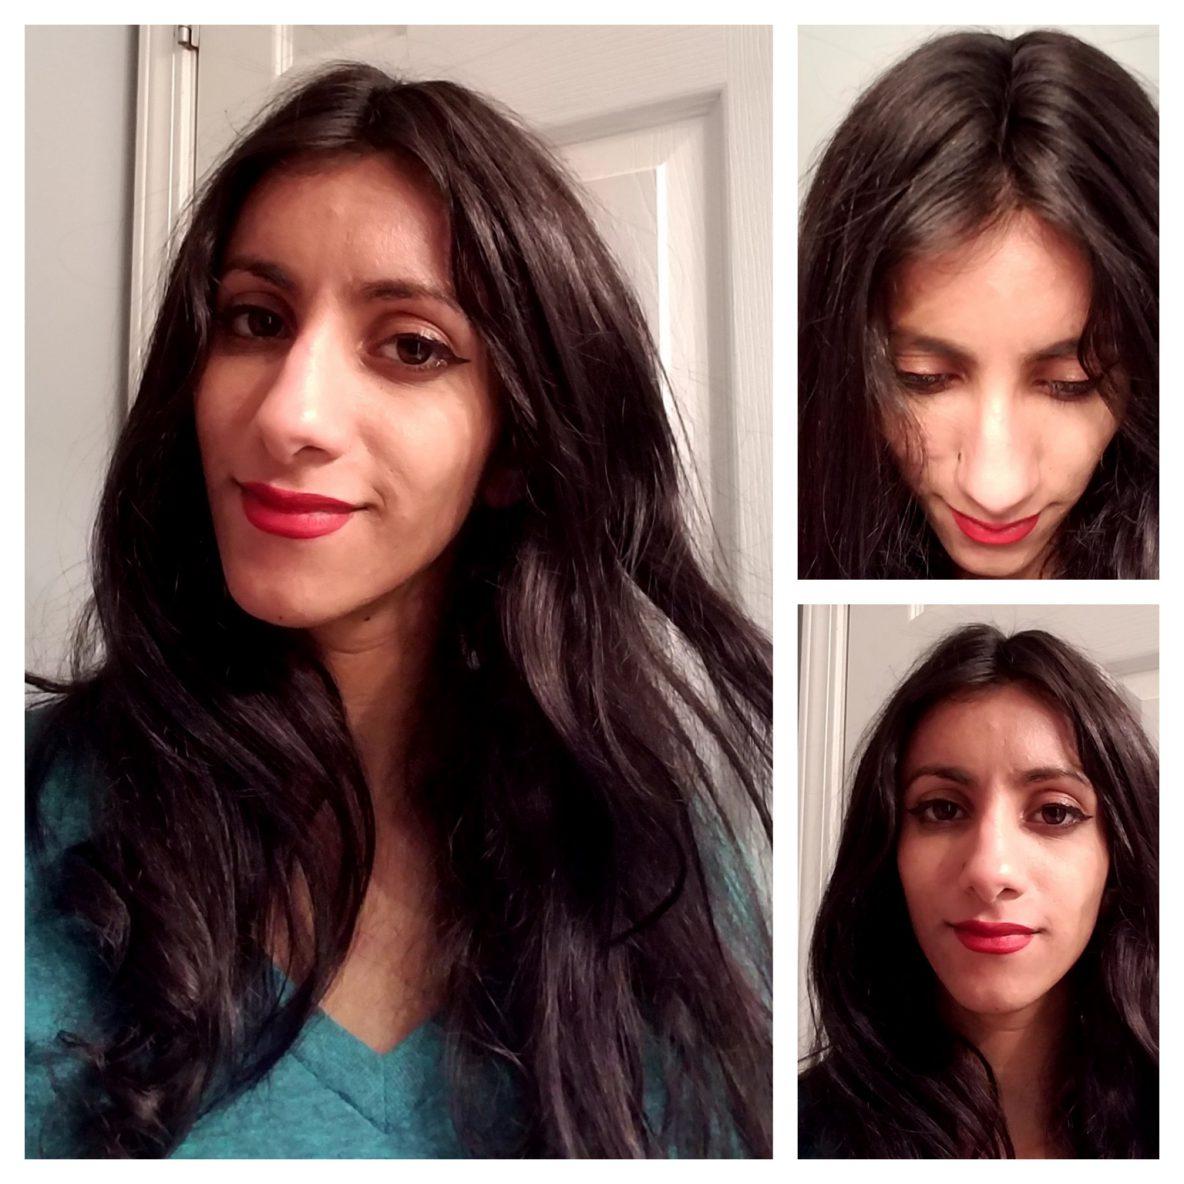 hair loss in women solution